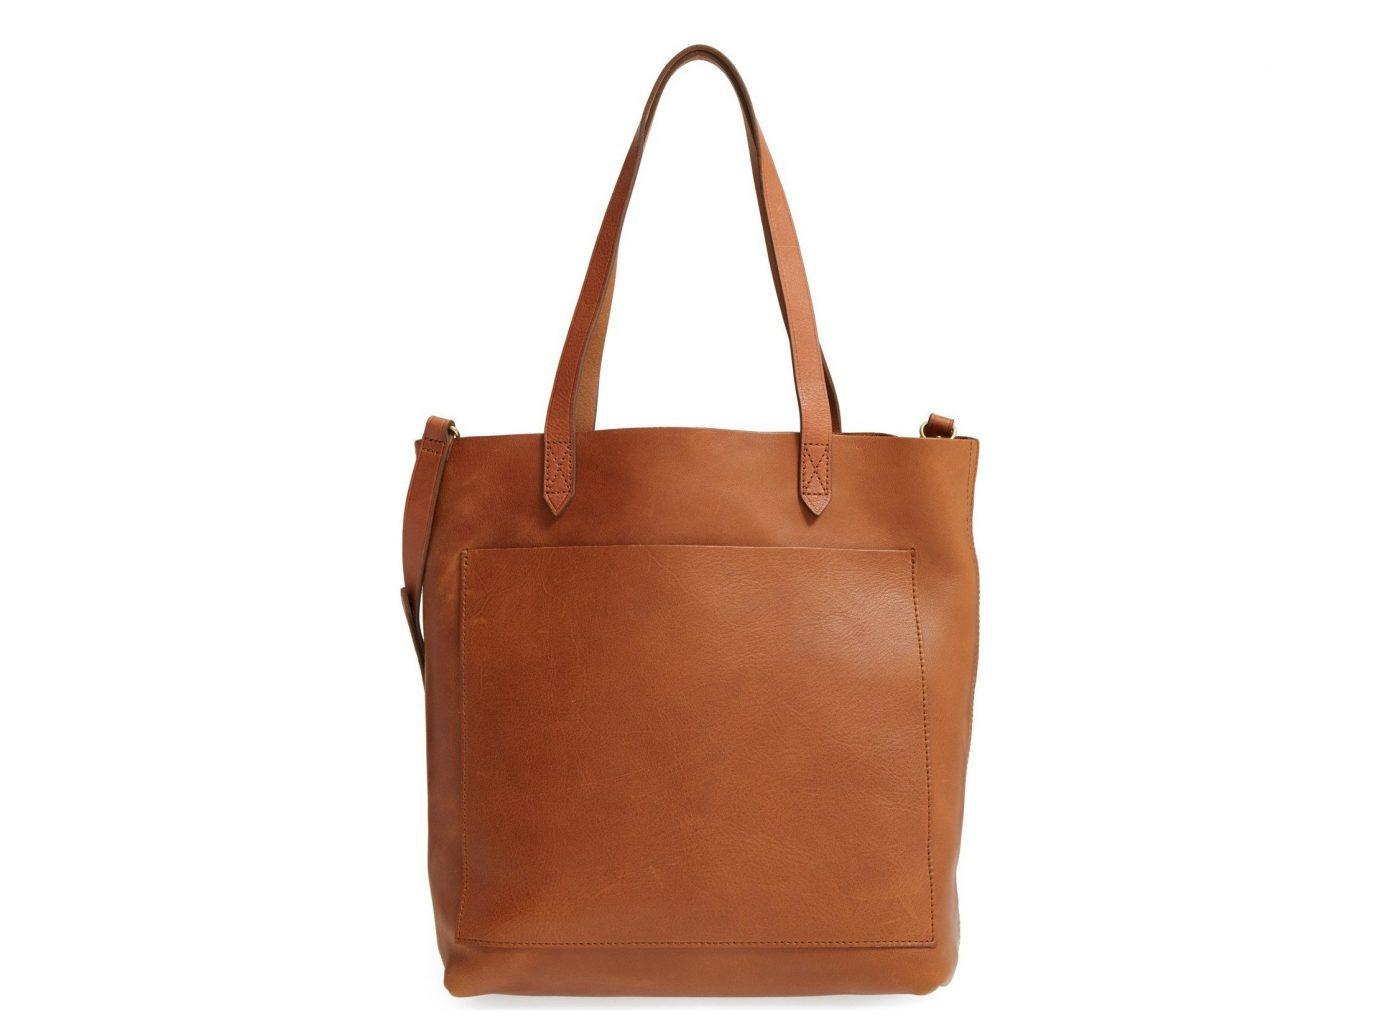 Packing Tips Style + Design Travel Shop Weekend Getaways accessory bag brown handbag case leather shoulder bag caramel color fashion accessory product beige tote bag peach product design brand